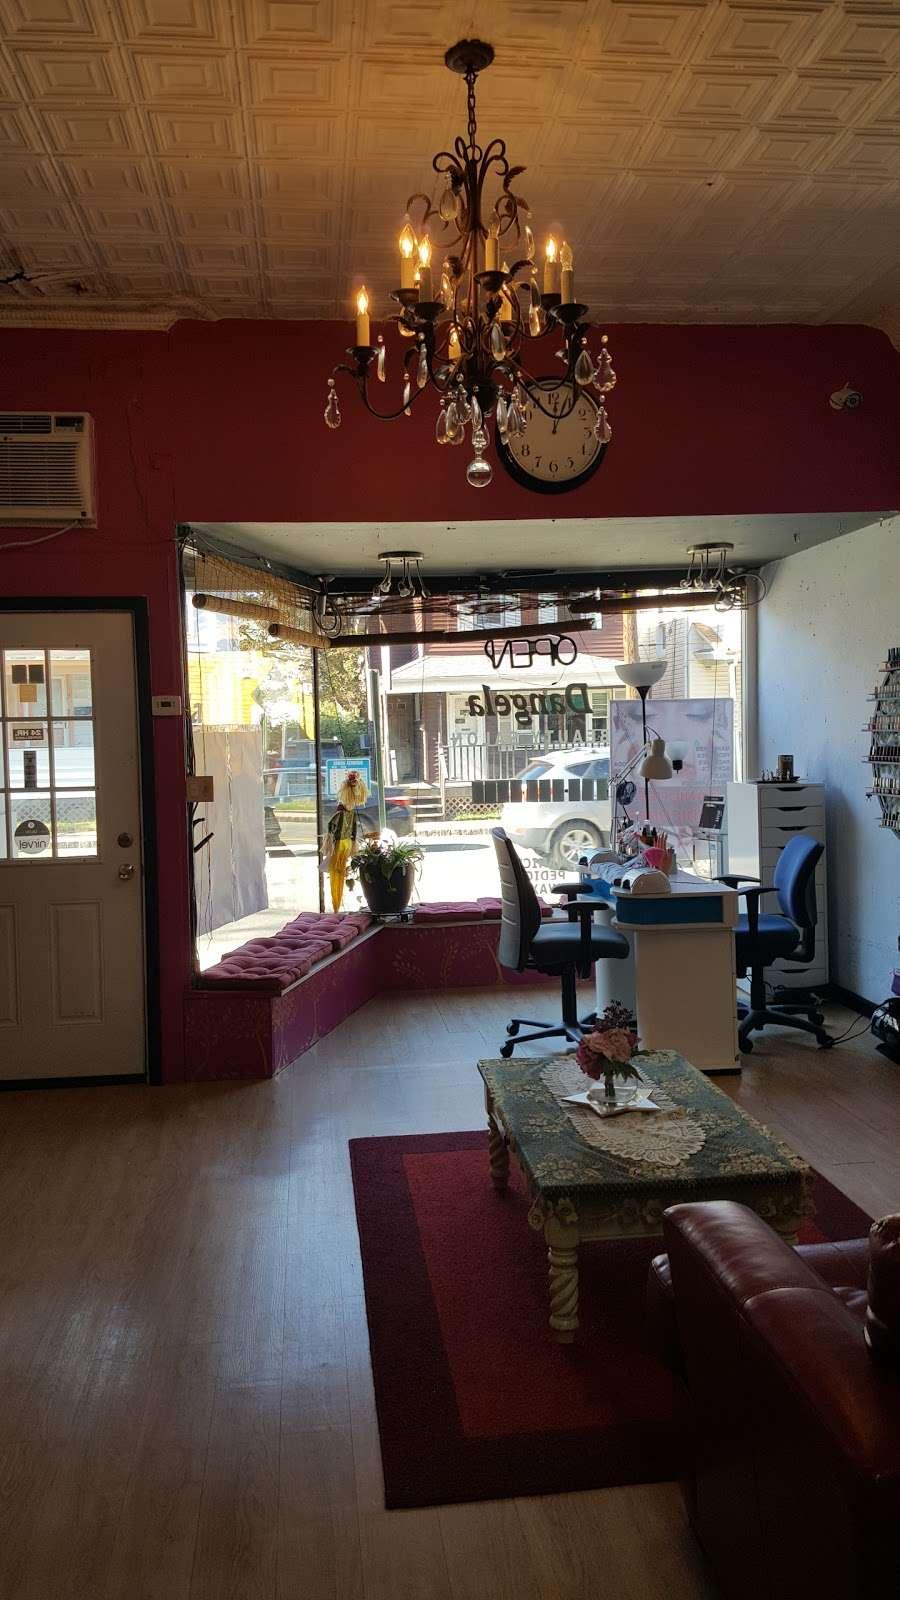 Dangela Beauty Salon - hair care  | Photo 7 of 10 | Address: 80 N Sussex St, Dover, NJ 07801, USA | Phone: (973) 978-7256